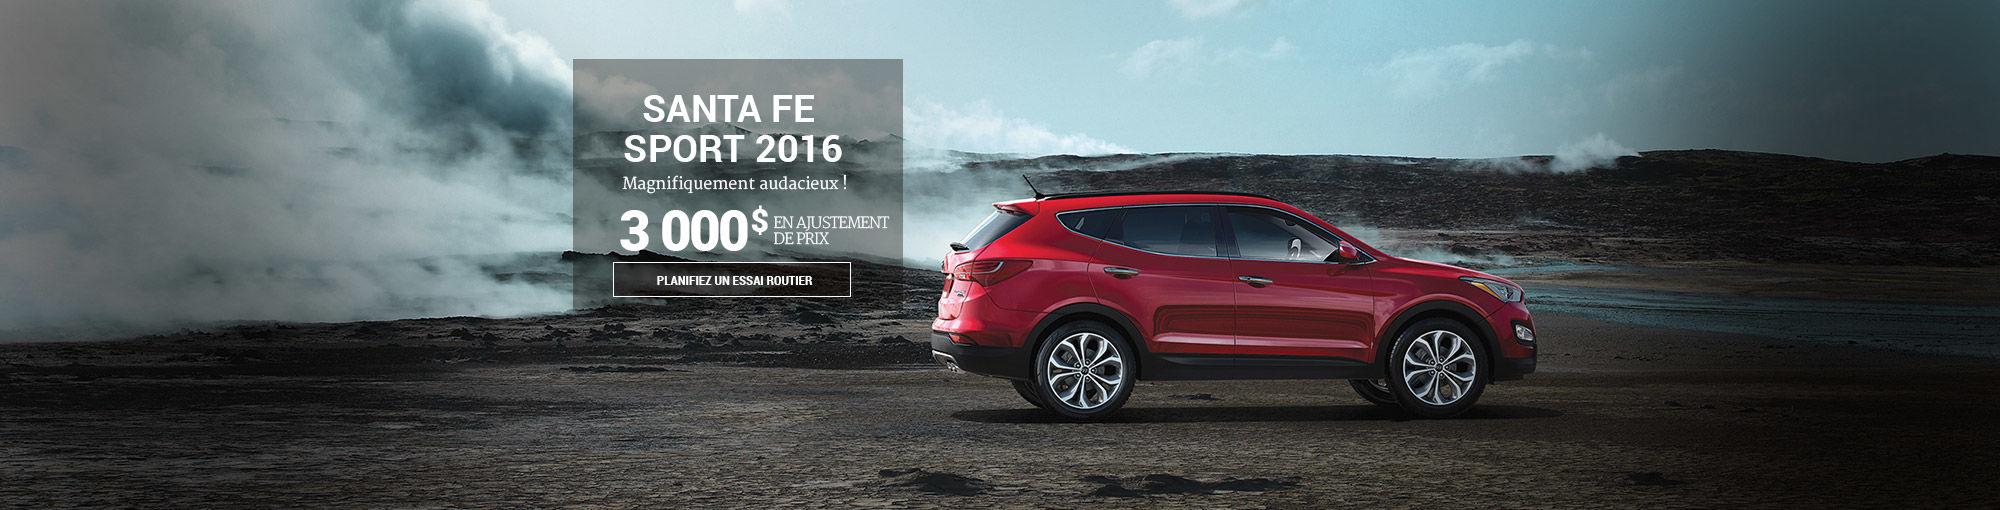 Hyundai Santa Fe Sport 2016 - header - février 2016